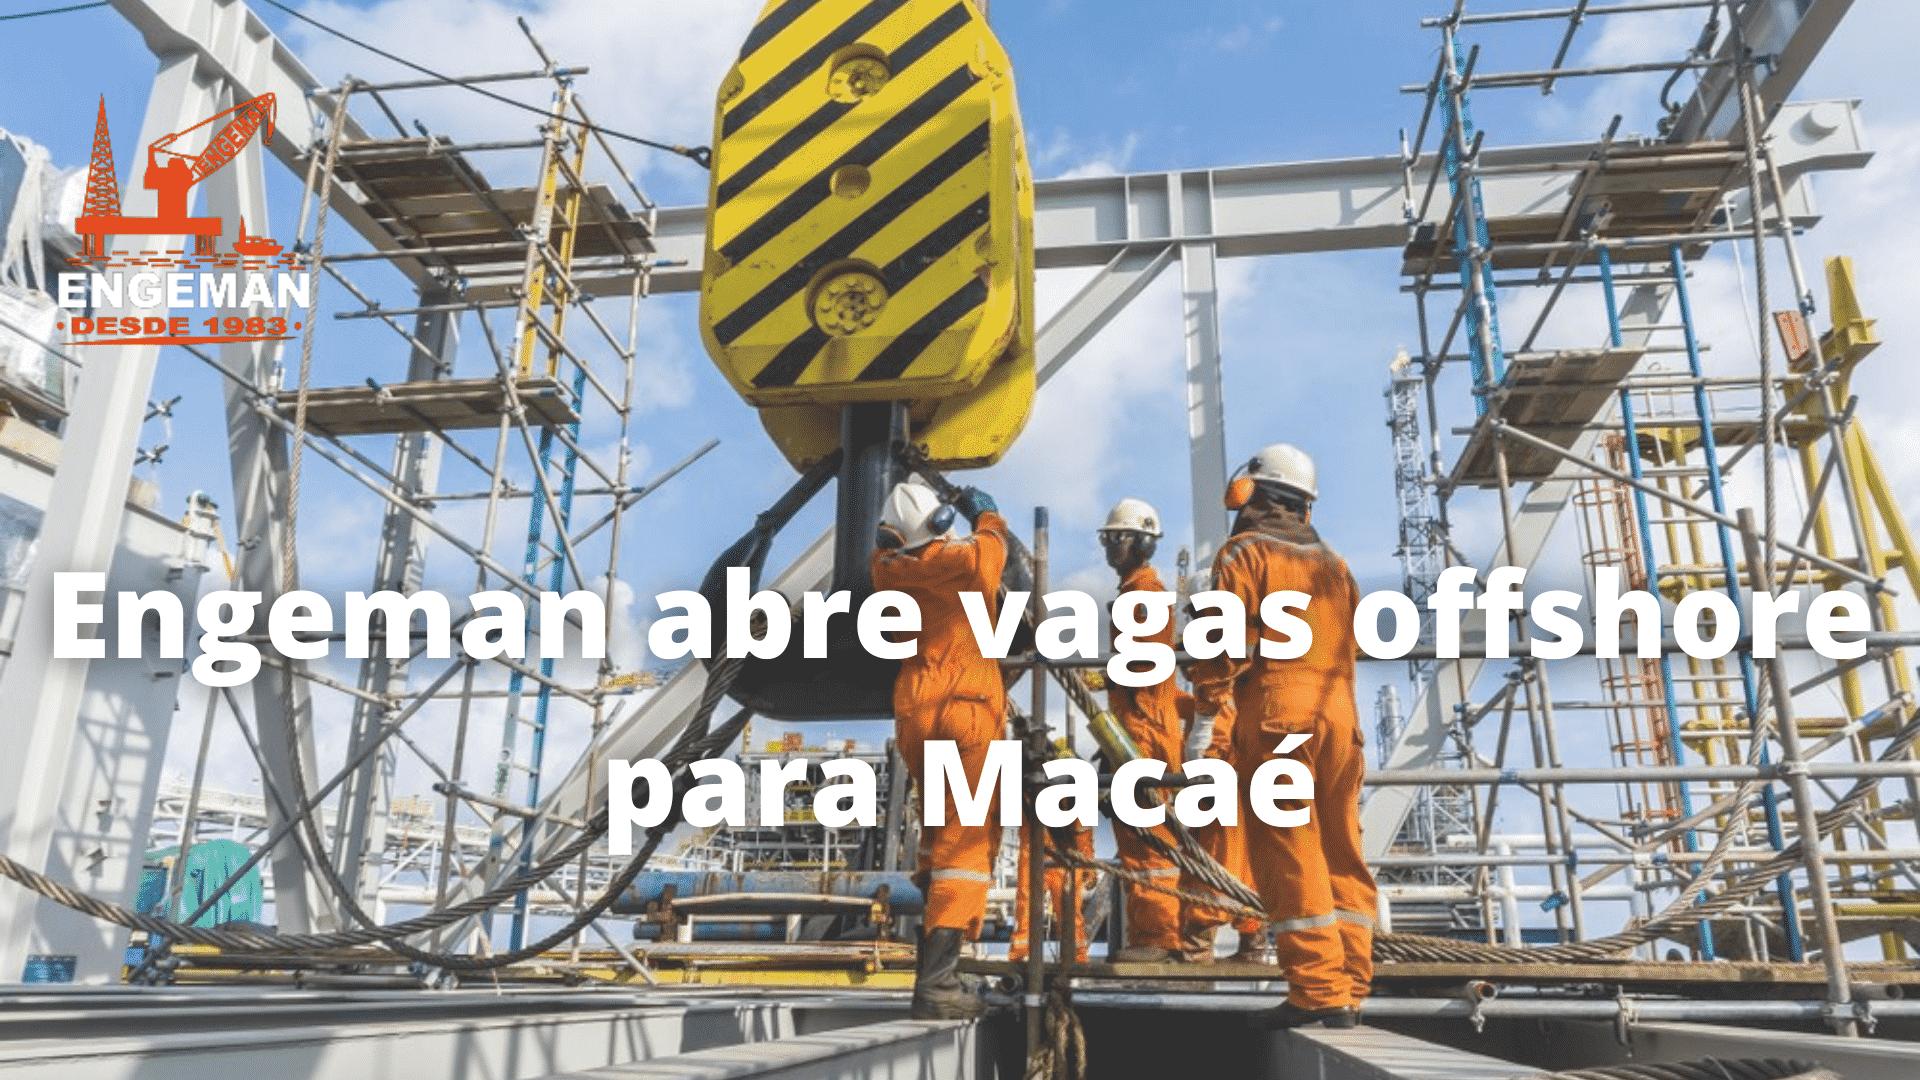 Emprego – offshore – Macaé – Engeman